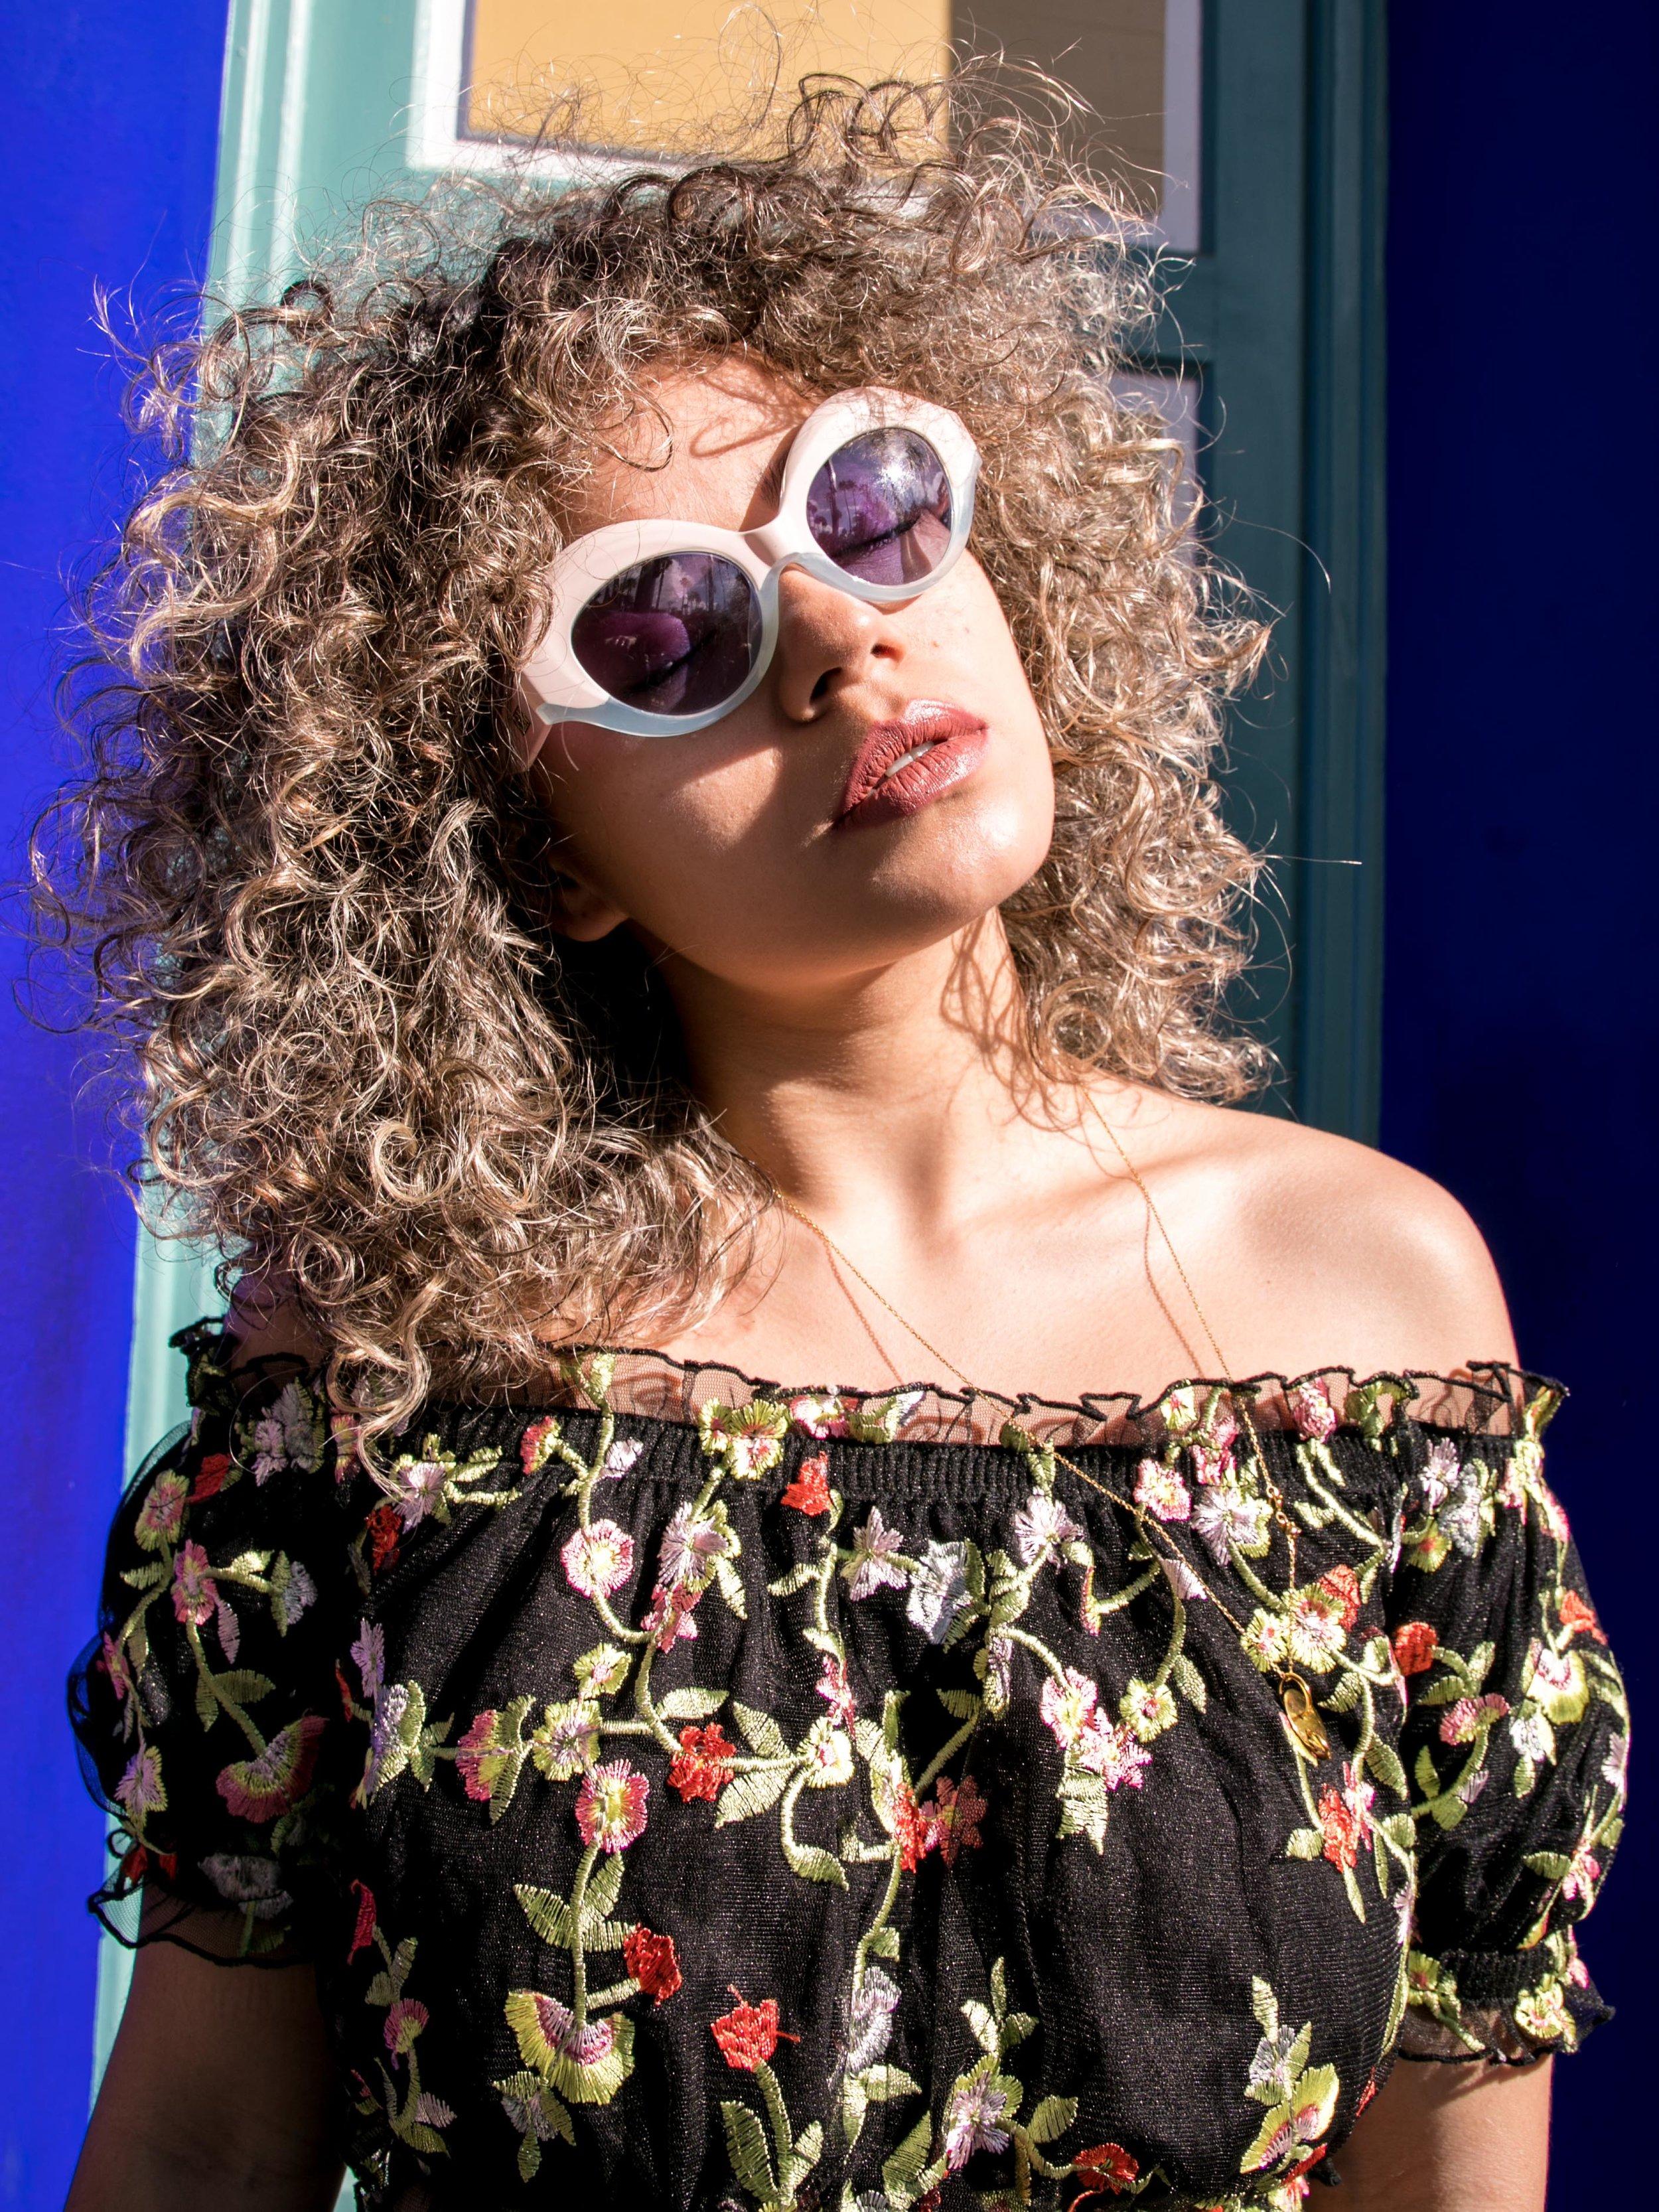 Celeste - @celmatique  speaker #honeysinmarrakech '17